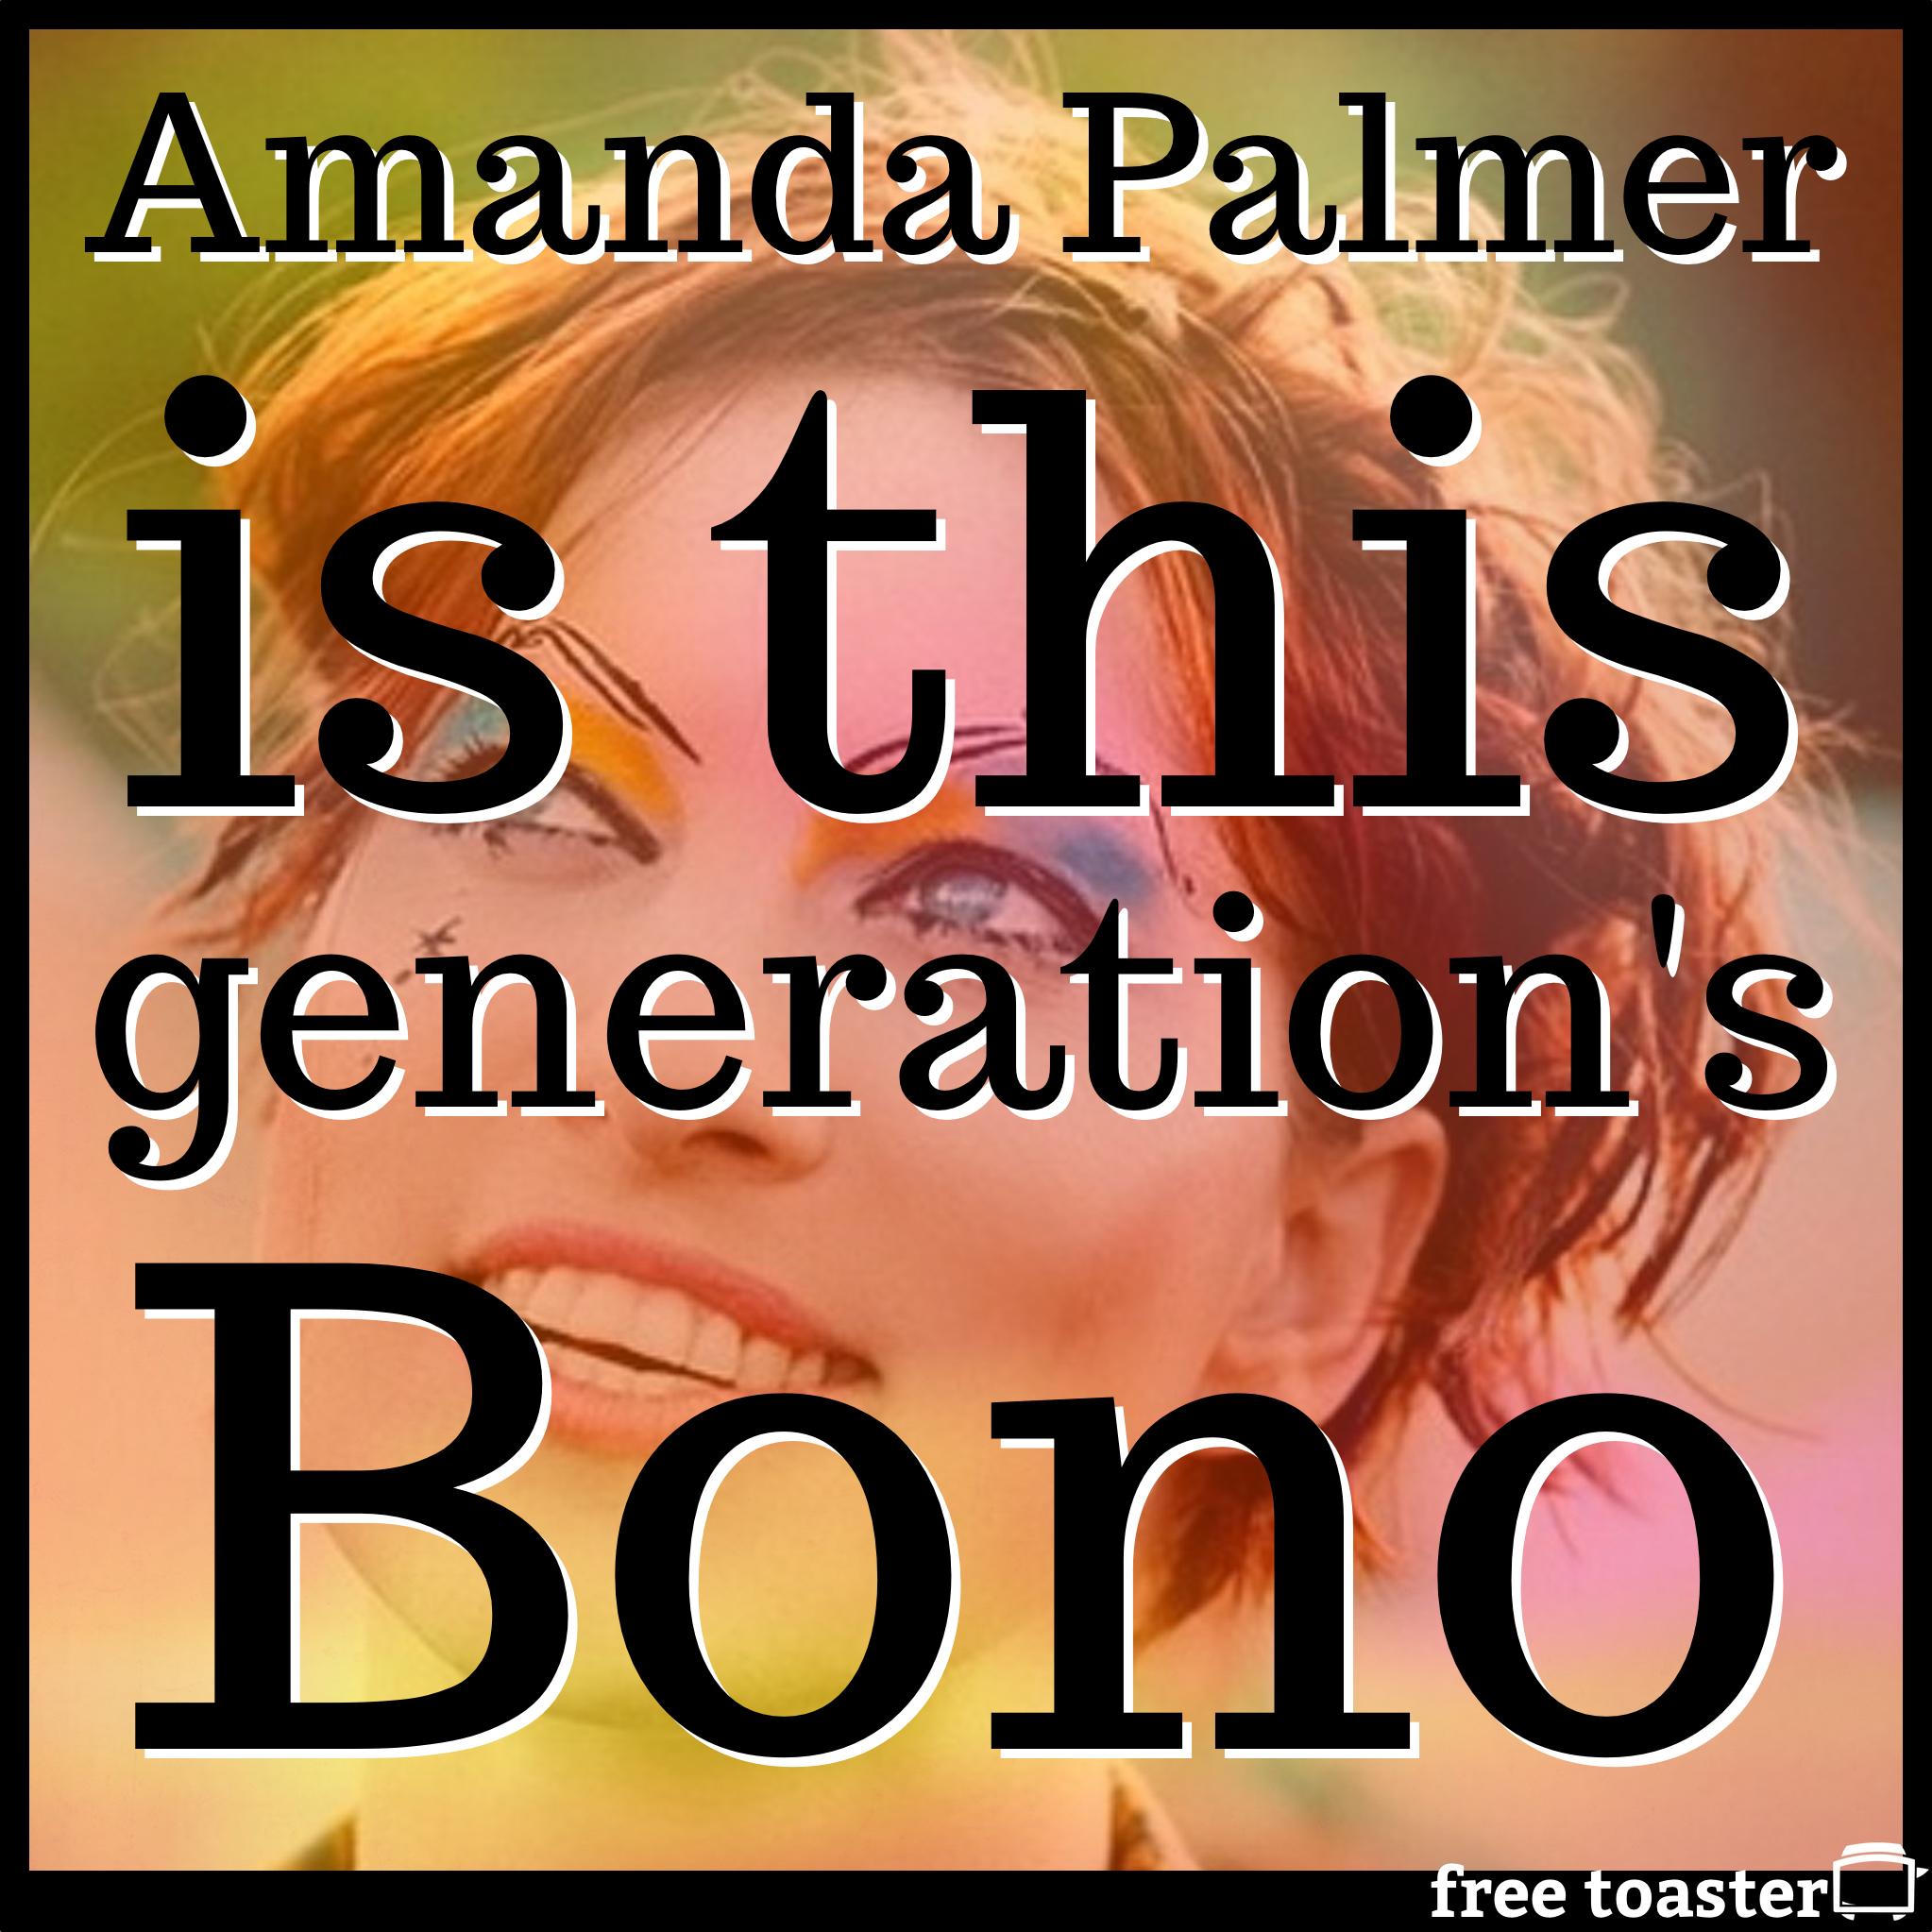 FREE TOASTER Amanda Palmer.jpg